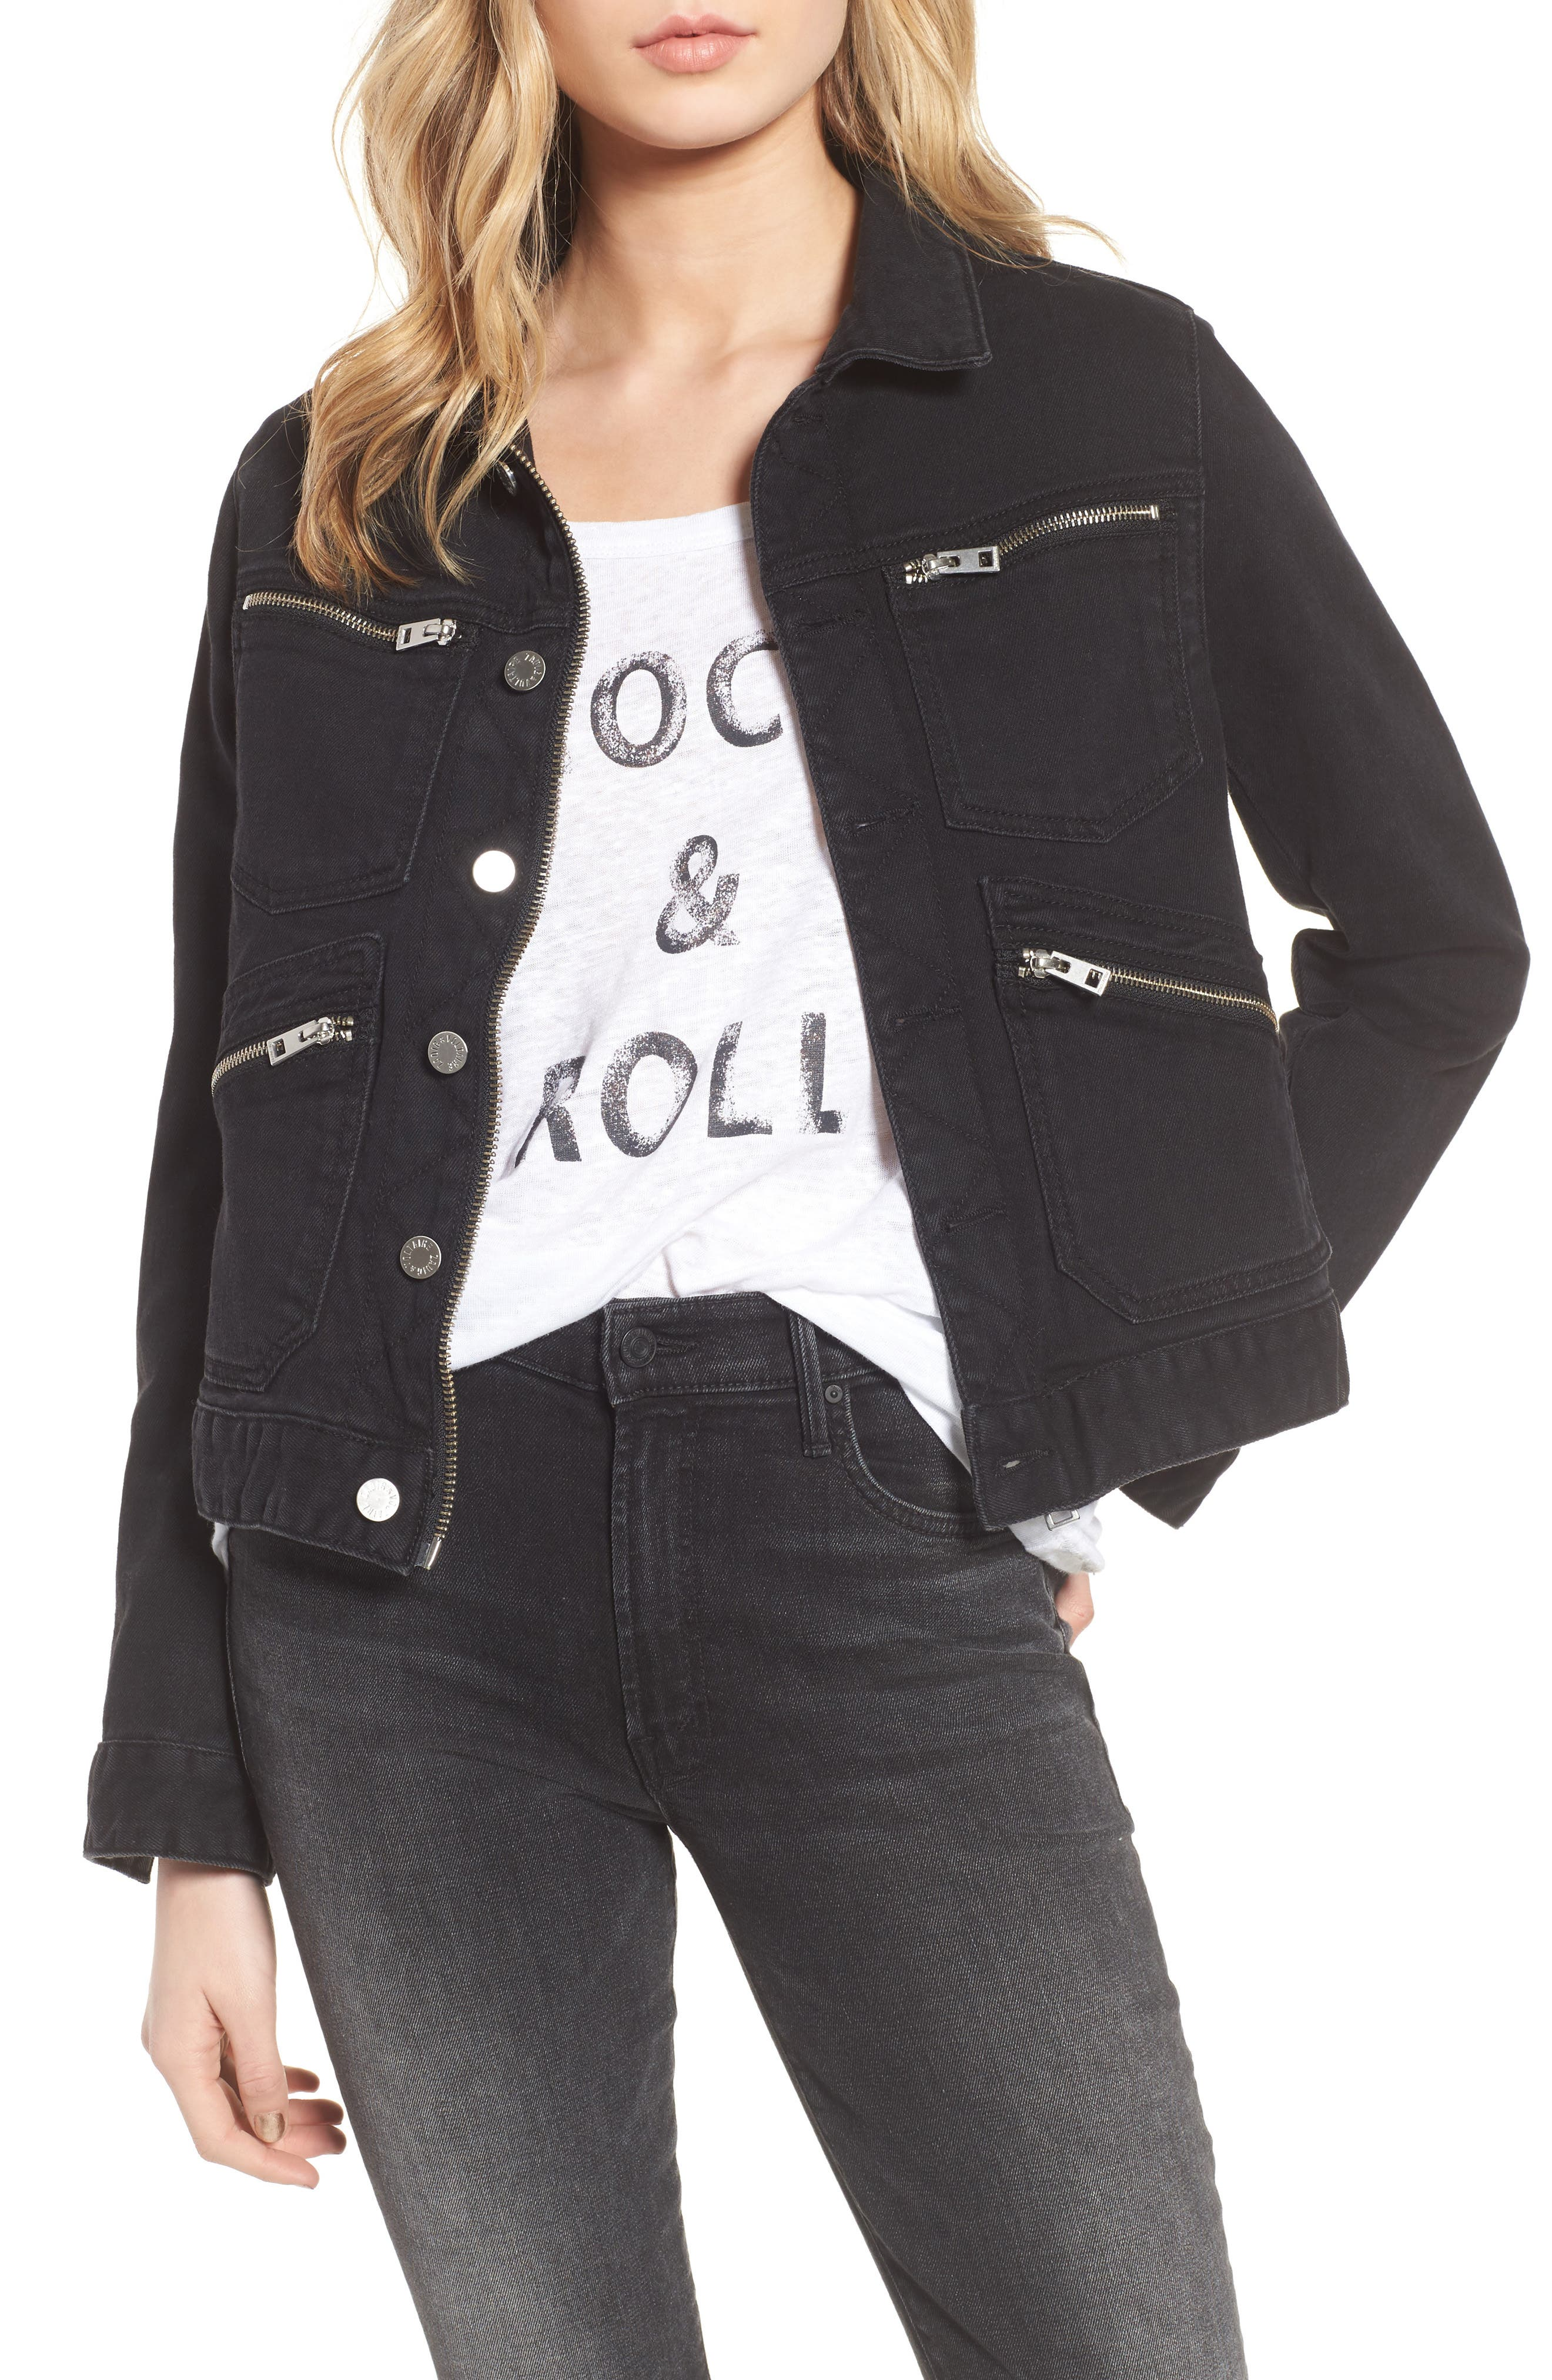 Kioko Cat Jacket,                         Main,                         color, 001